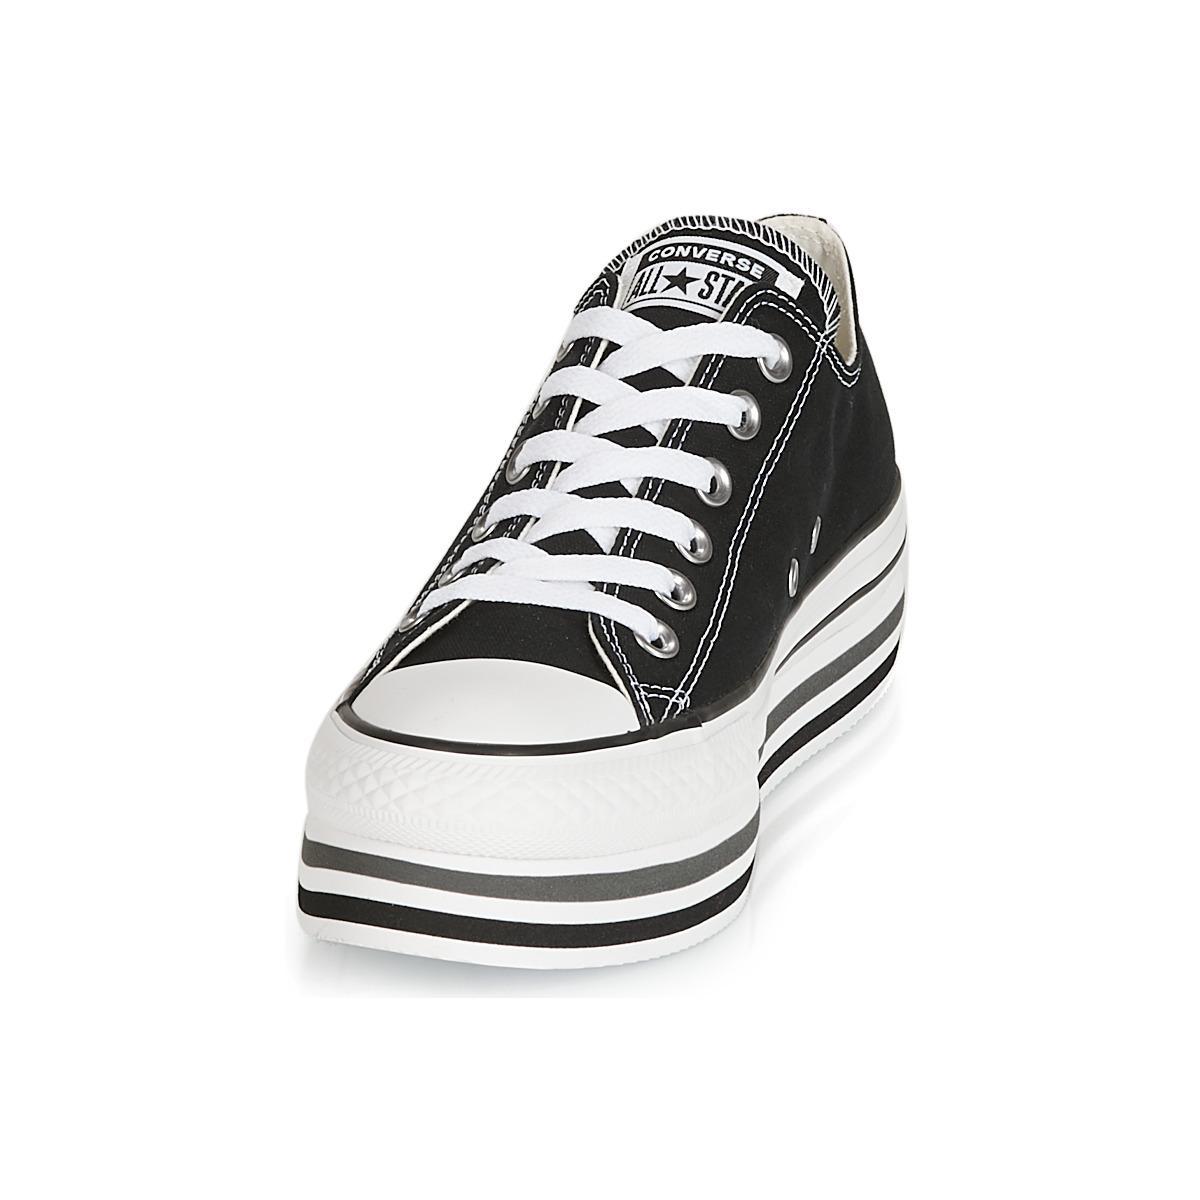 aed78efb5f9e Converse - Black Chuck Taylor All Star Platform Sneakers - Lyst. View  fullscreen